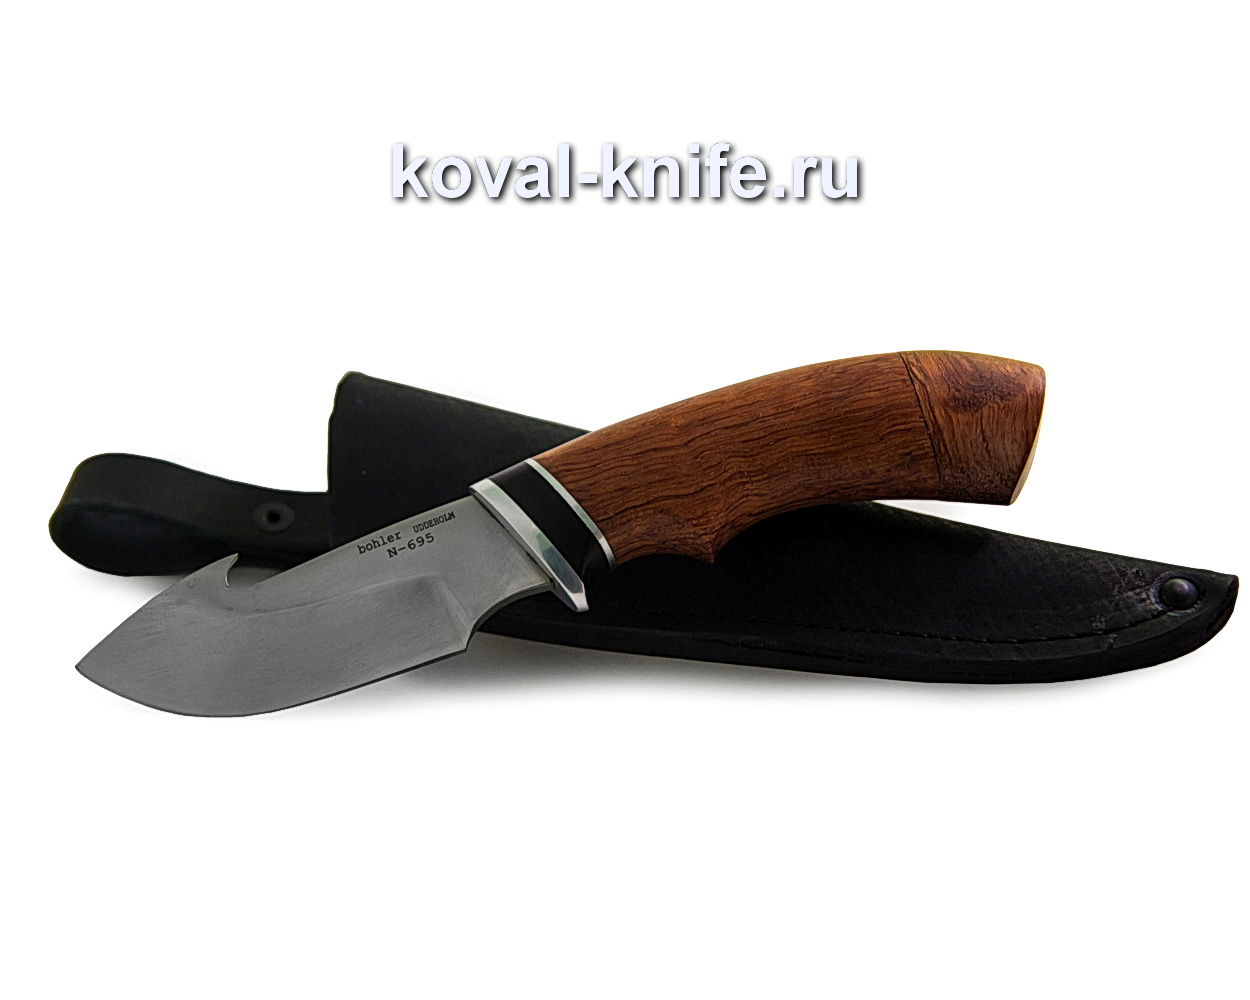 Нож из нержавеющей стали N695 Стропорез (Bohler N695, рукоять орех) A337